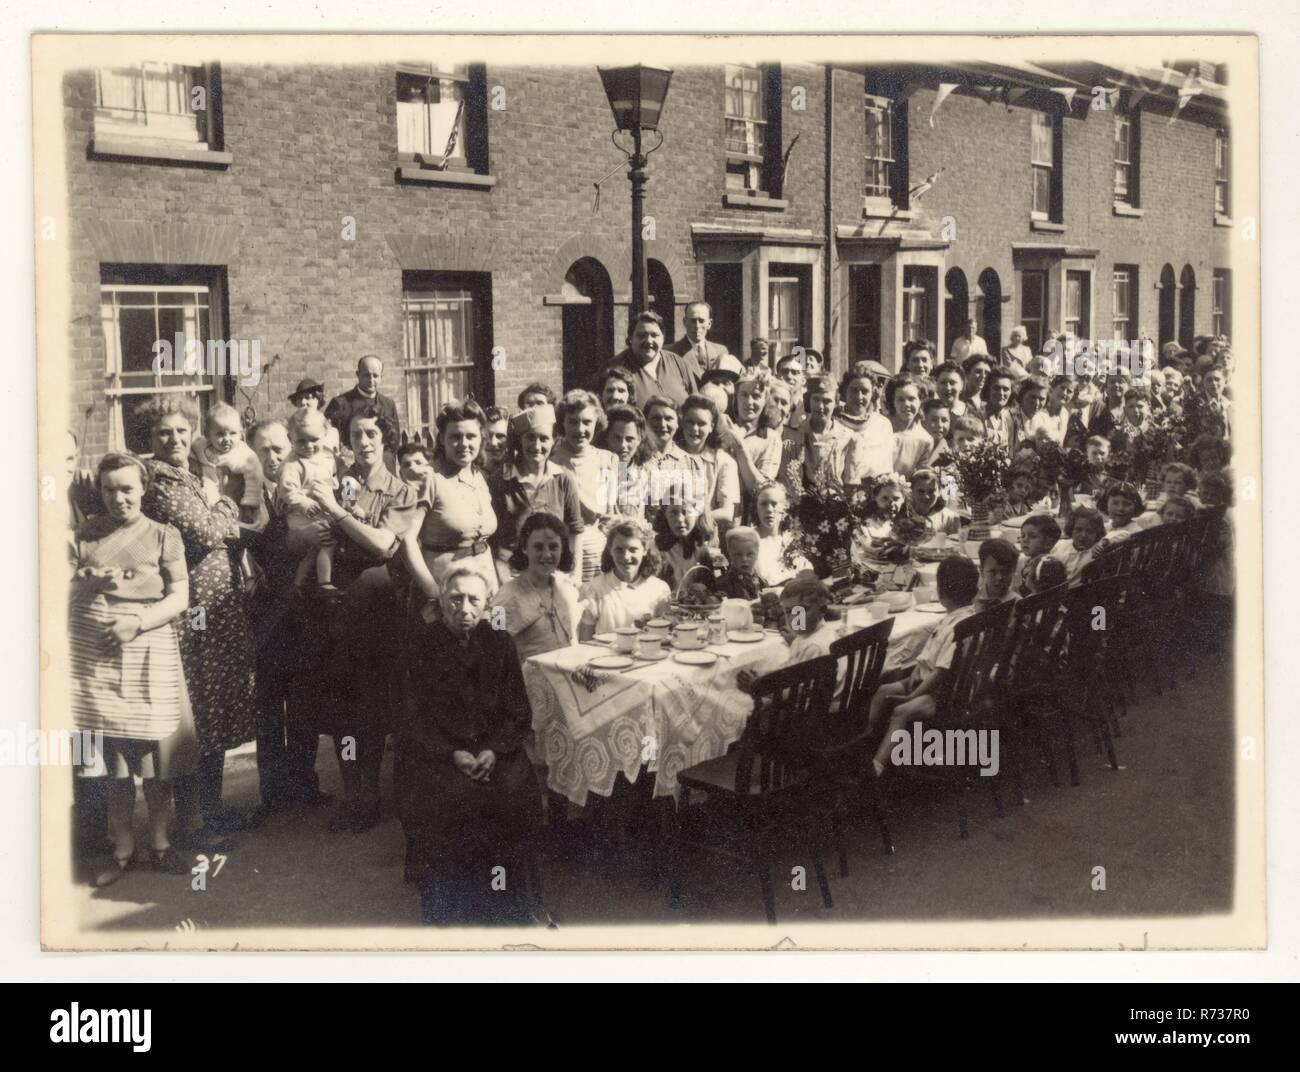 WW2 Street peace V.E. day party celebration unknown location, U.K. dated 12 May 1945 Stock Photo